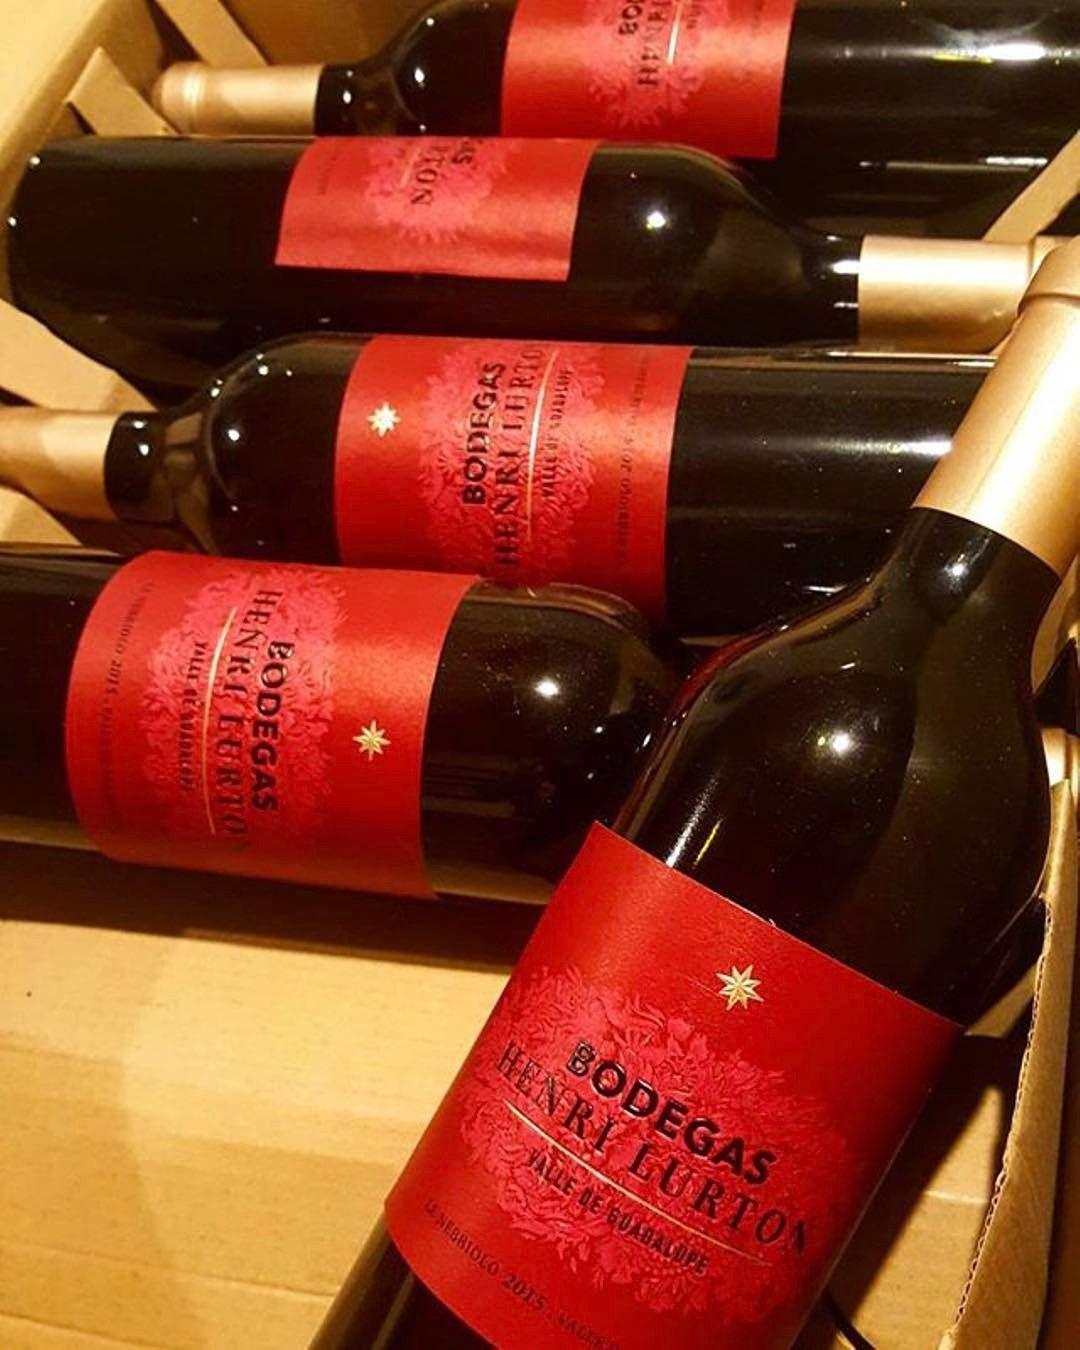 Le Nebbiolo 2015 Medalla De Plata En Mundis Vini Alemania 2017 Merci O Negrete Henrilurton Bordeauxinmexico Wine Bottle Instagram Instagram Posts